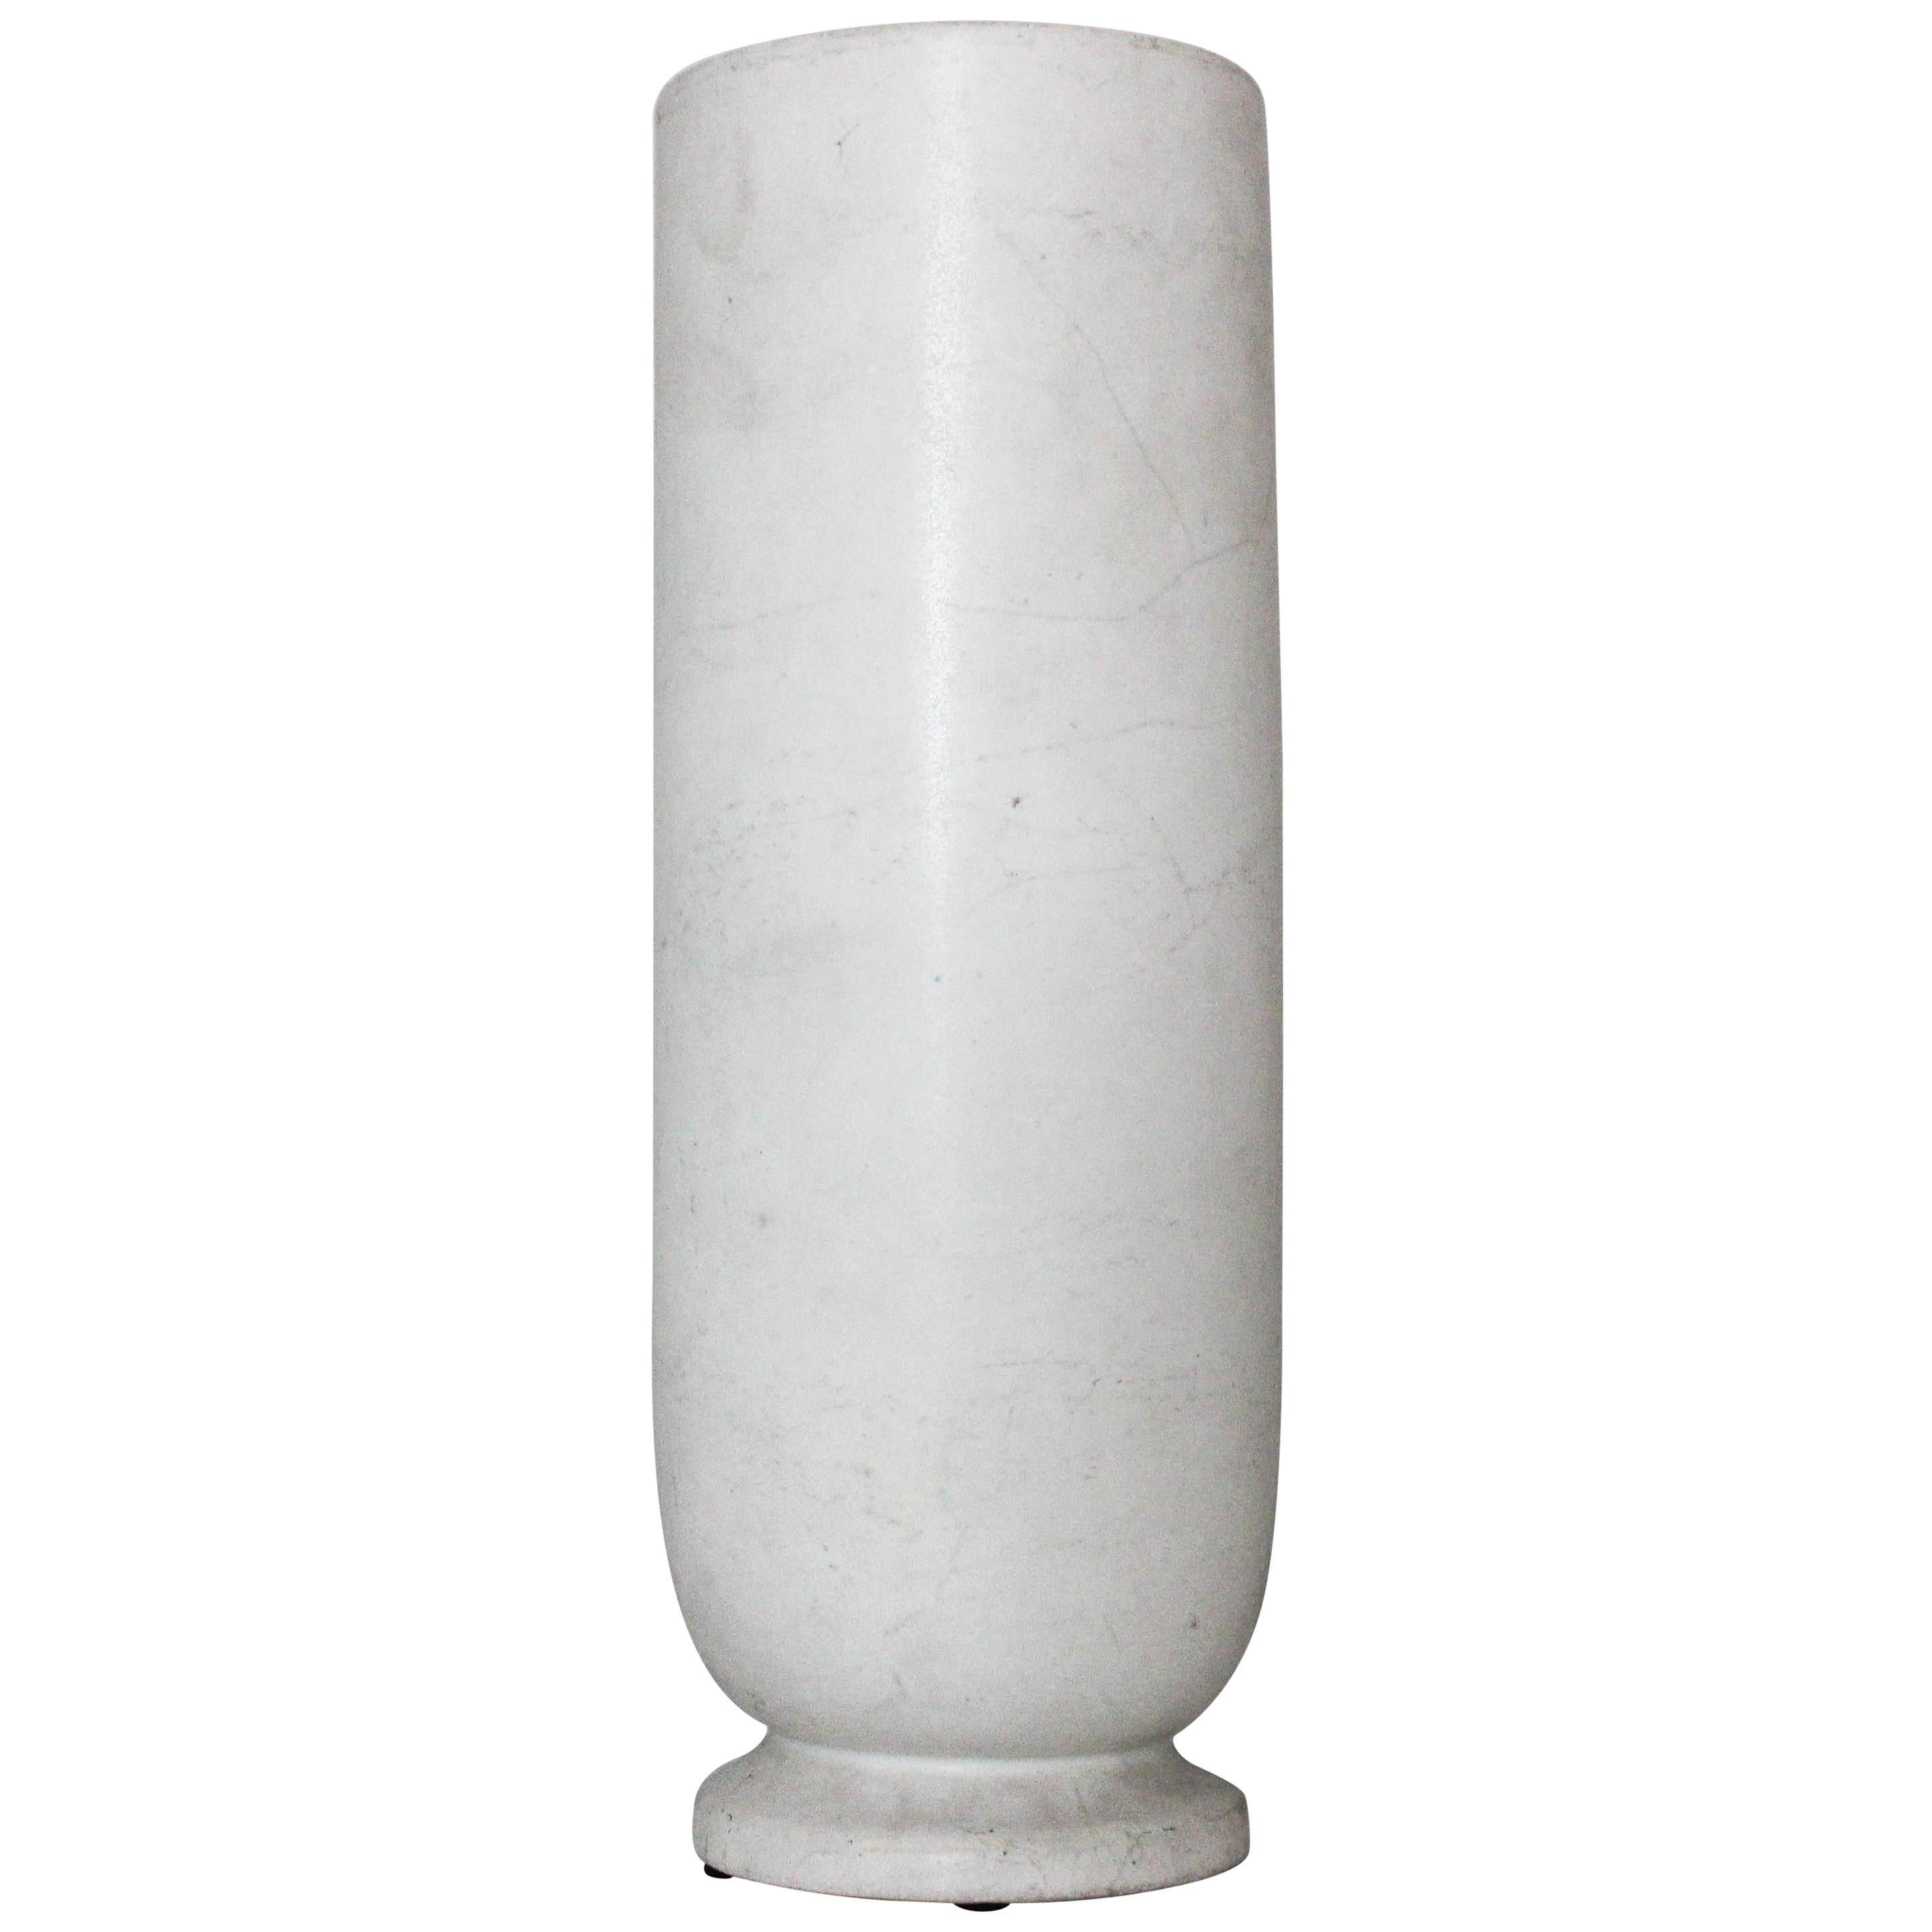 "Midcentury Wilhelm Kåge ""Carrara"" Vase by Gustavsberg"